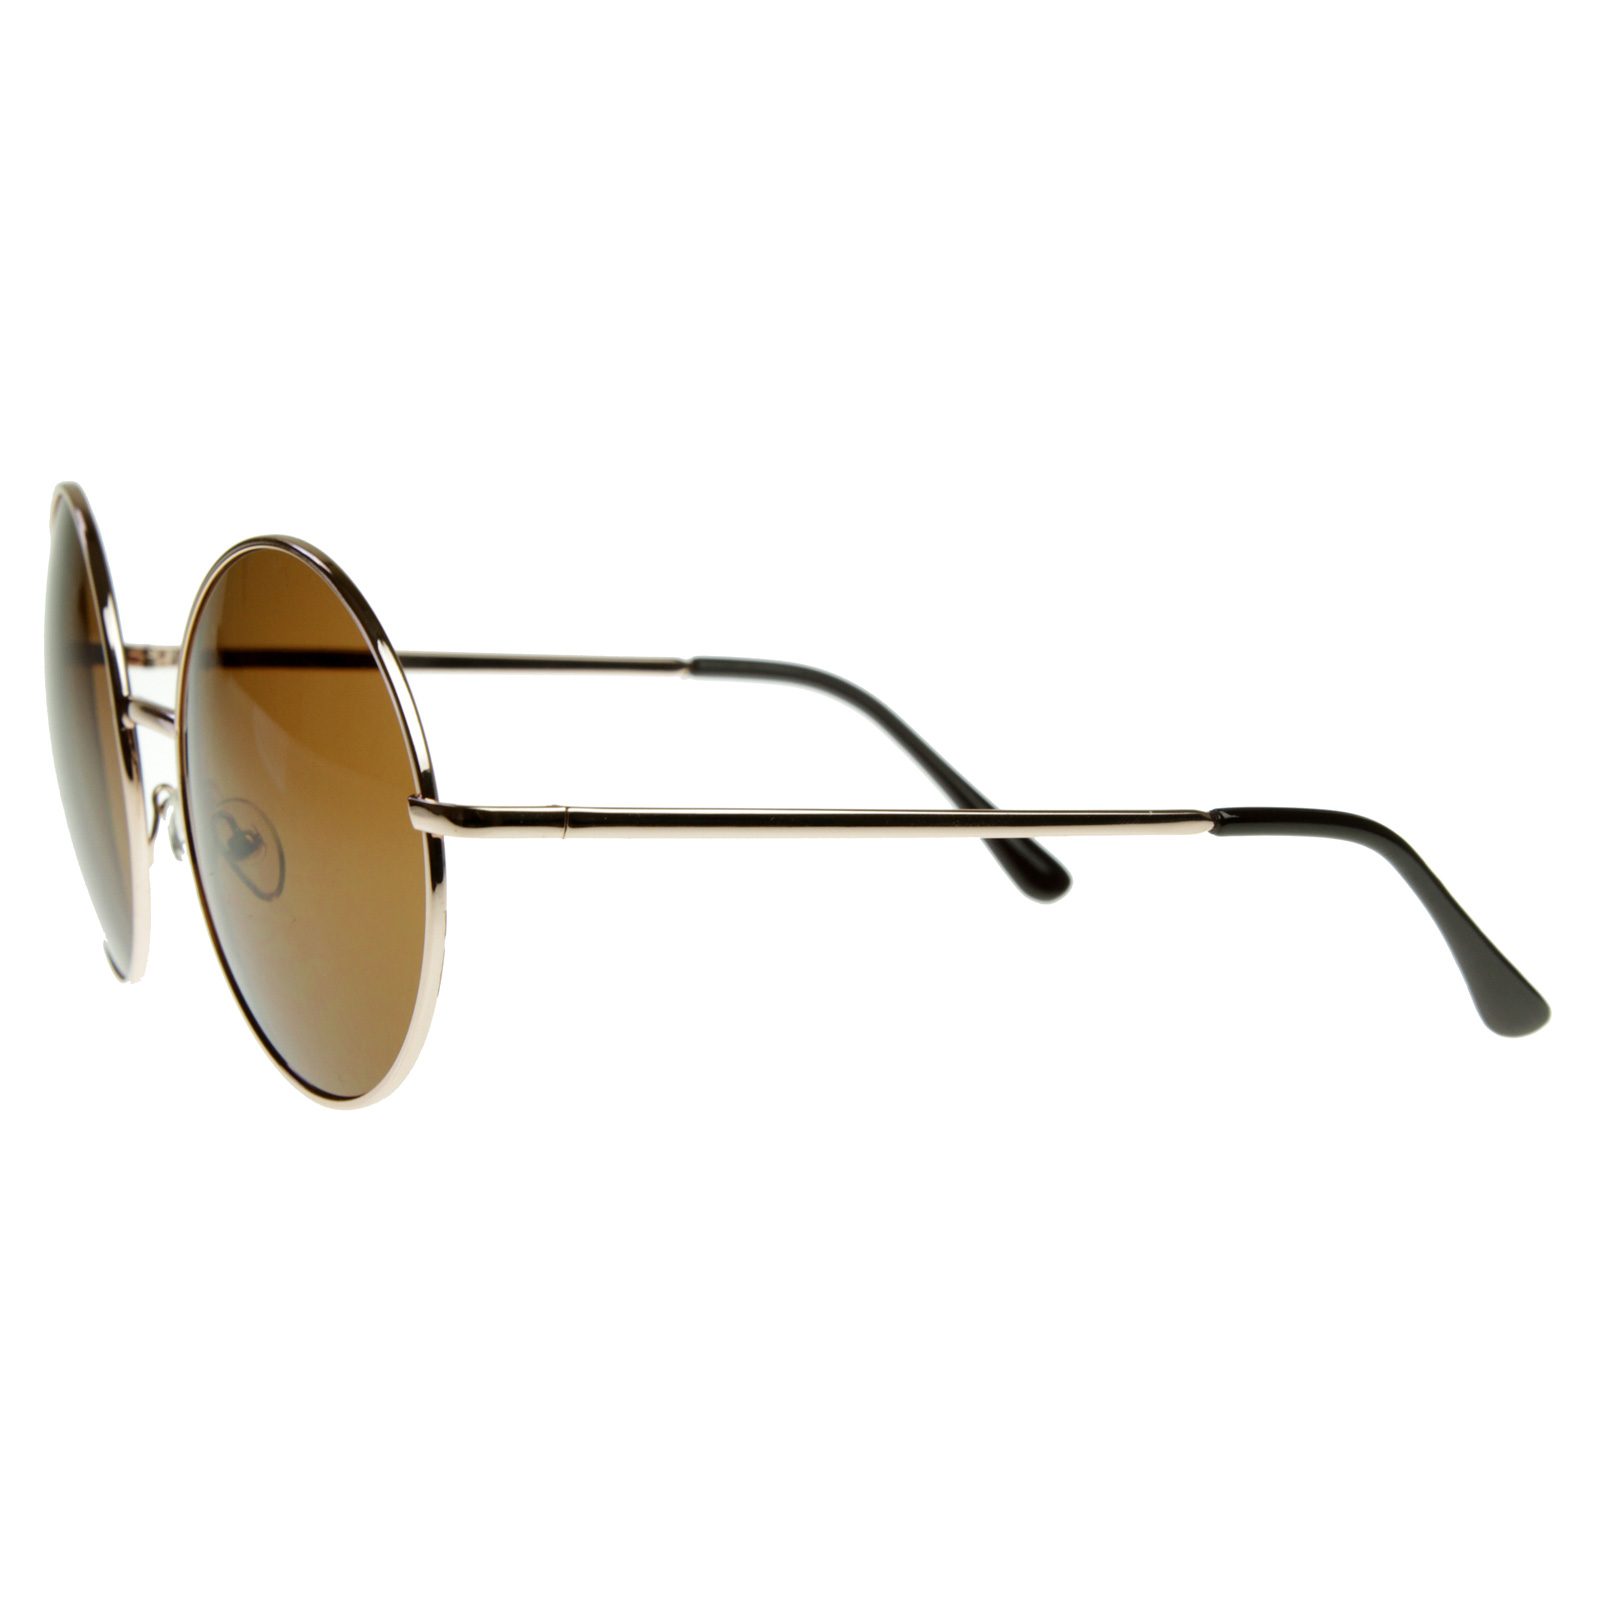 Trendy Vintage Inspired Large Oversize Full Metal Round Circle Sunglasses 8370 | eBay